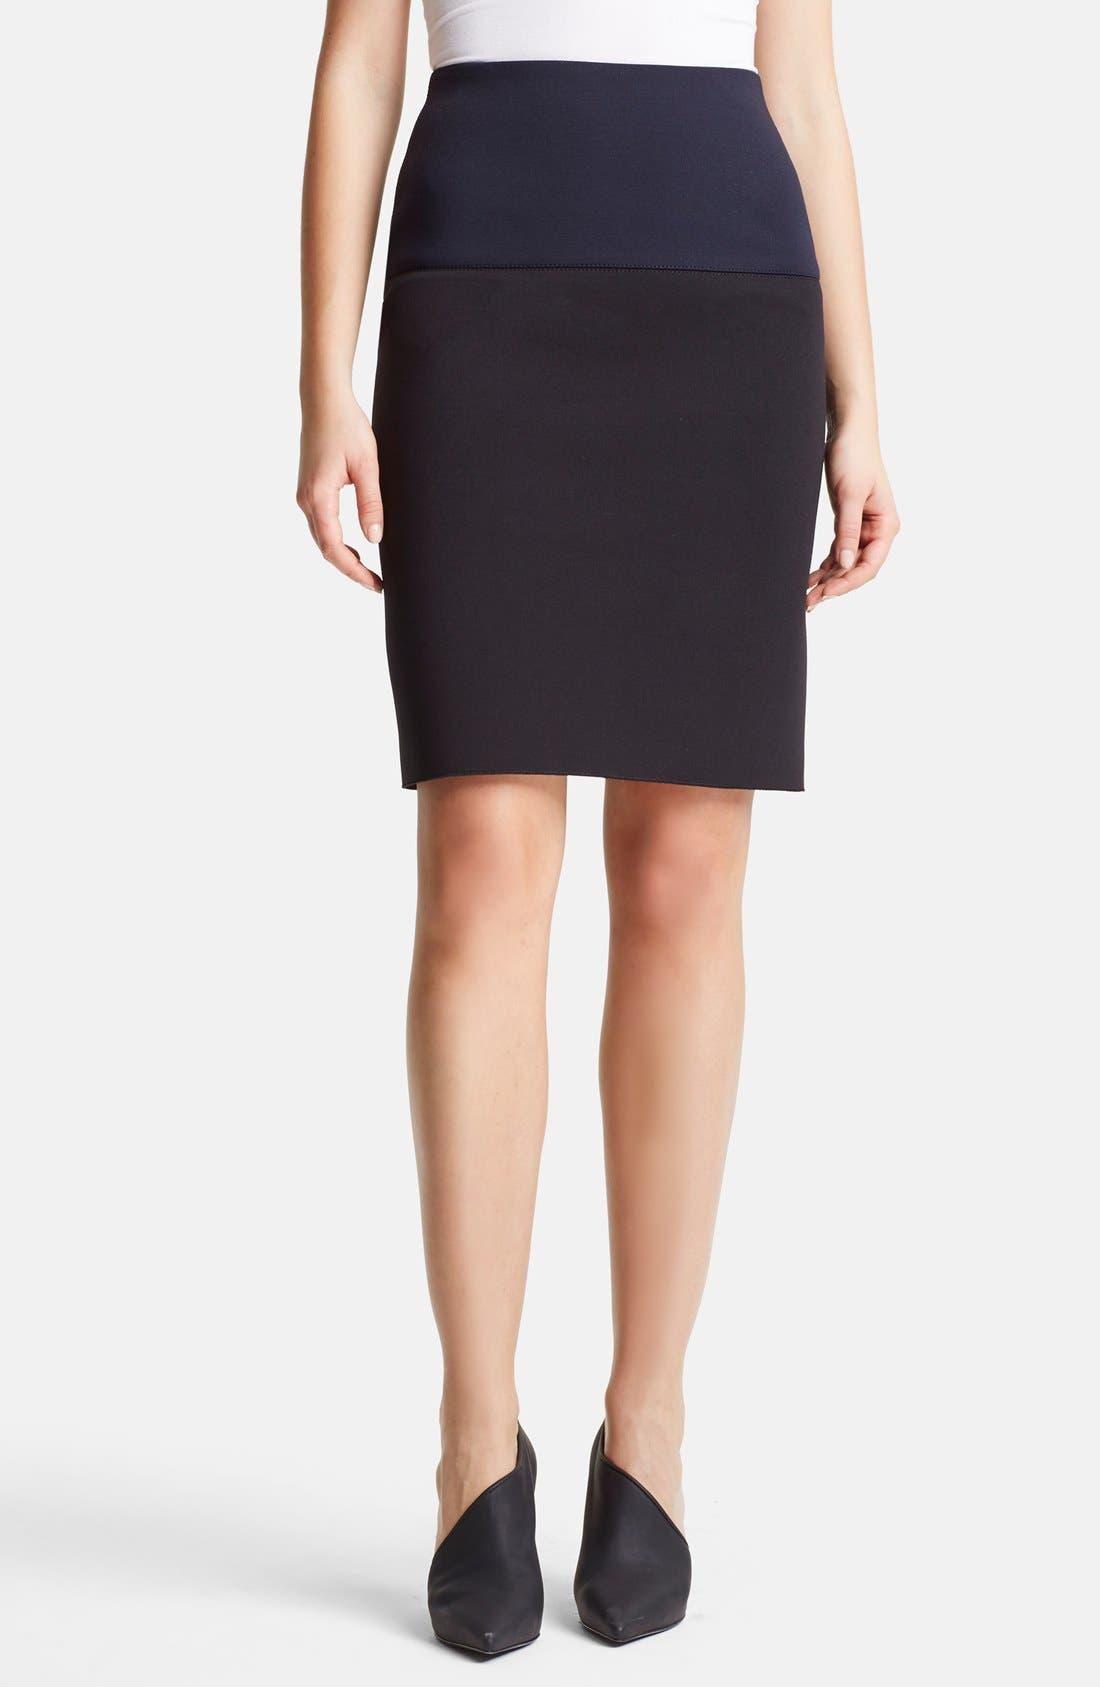 Alternate Image 1 Selected - Lanvin Two-Tone Pencil Skirt